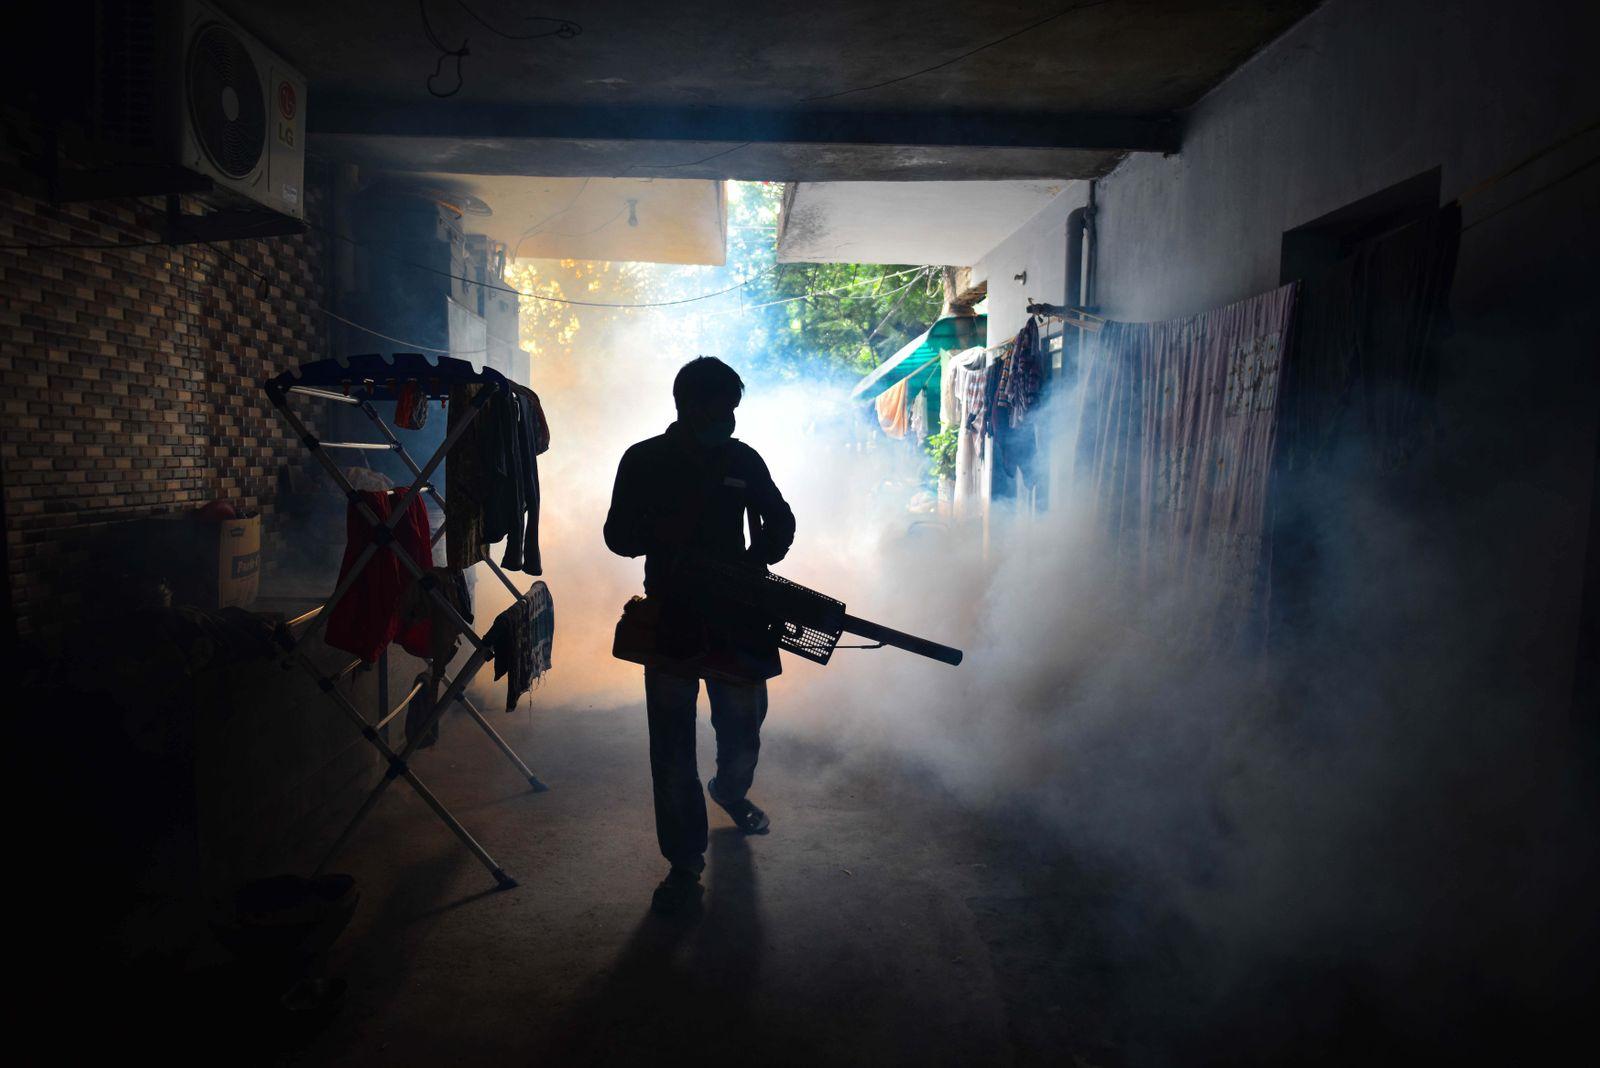 MCD Fumigation Drive In Delhi Against The Spread Of Dengue, Malaria And Chikungunya Diseases